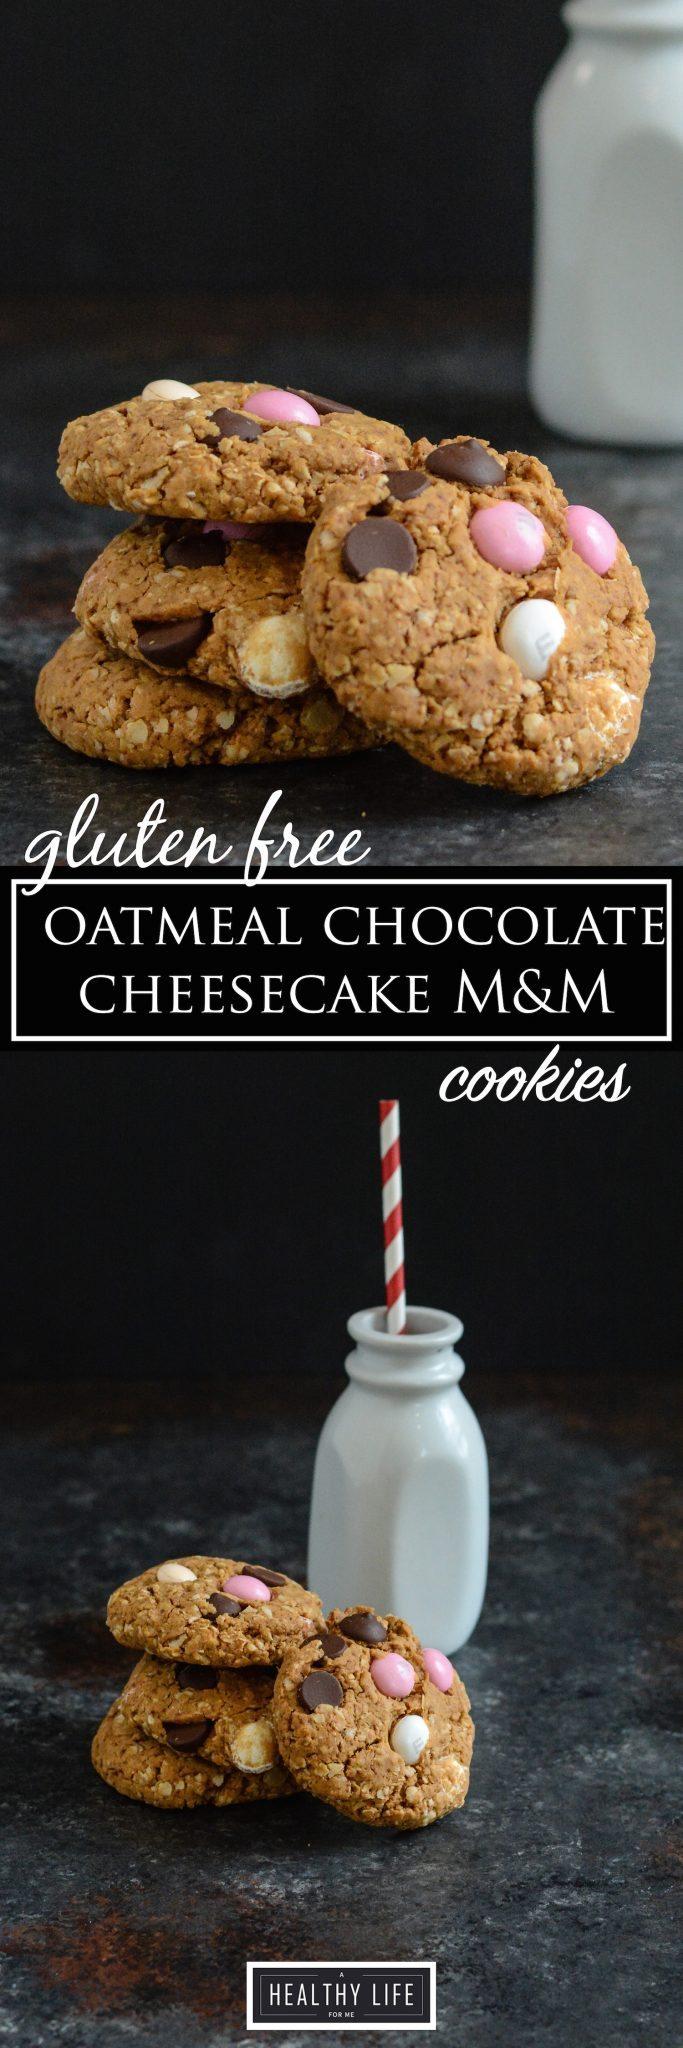 Oatmeal Chocolate Cheesecake M&M Cookie Recipe | ahalthylifeforme.com